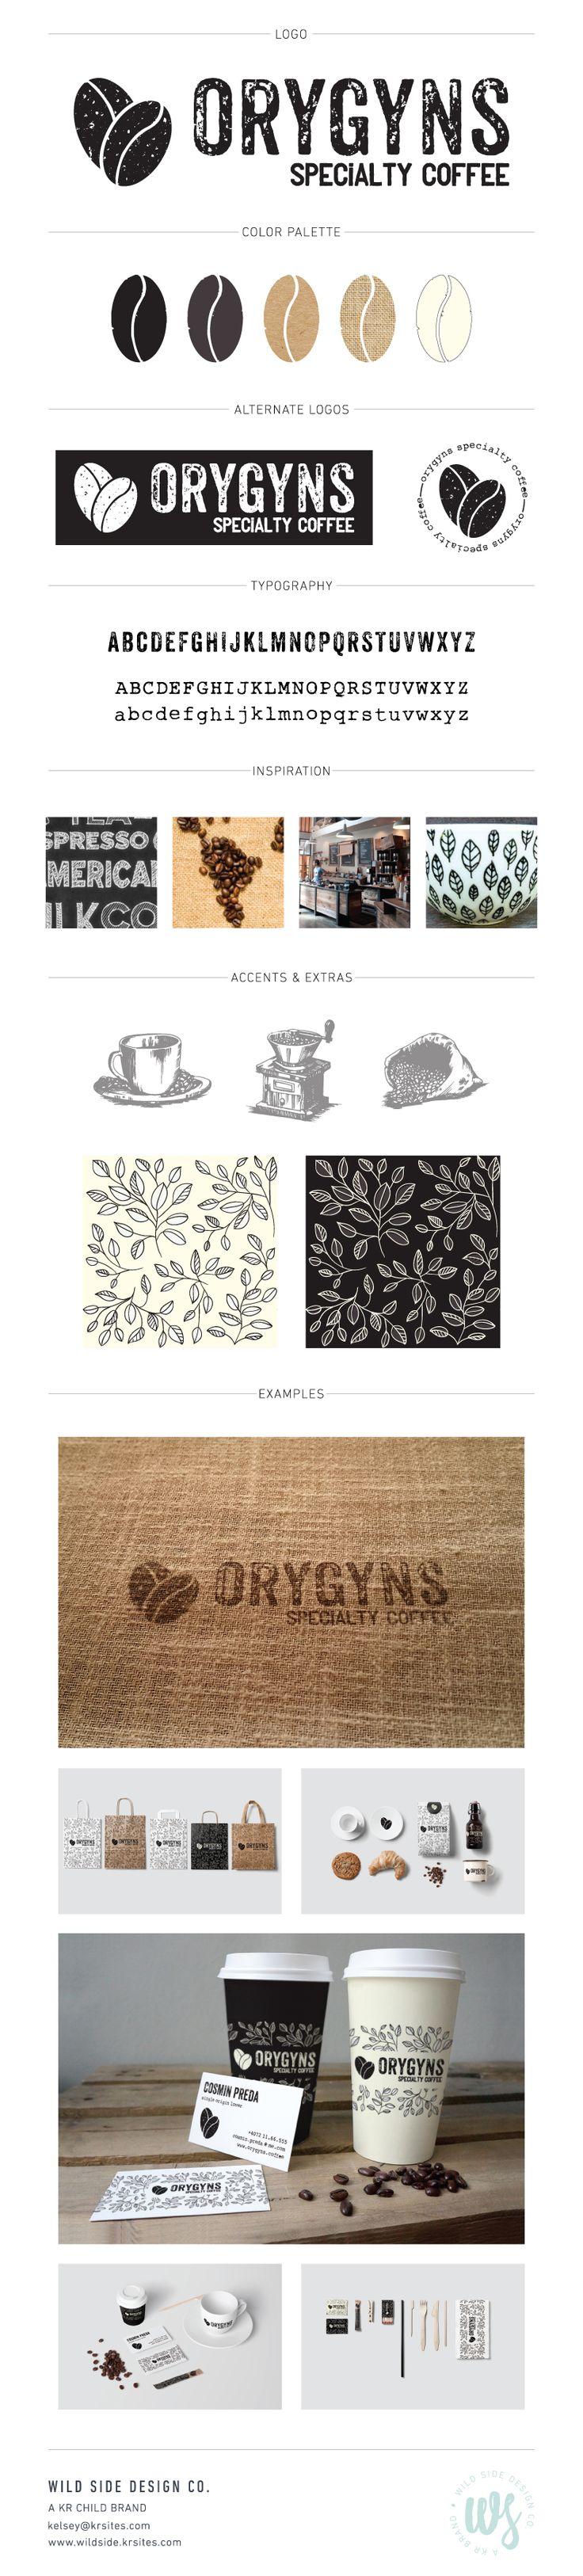 Brand Launch | Brand Style Board | Coffee Shop Branding | Orygyns Brand Design by Wild Side Design Co. | #branding www.wildside.krsites.com